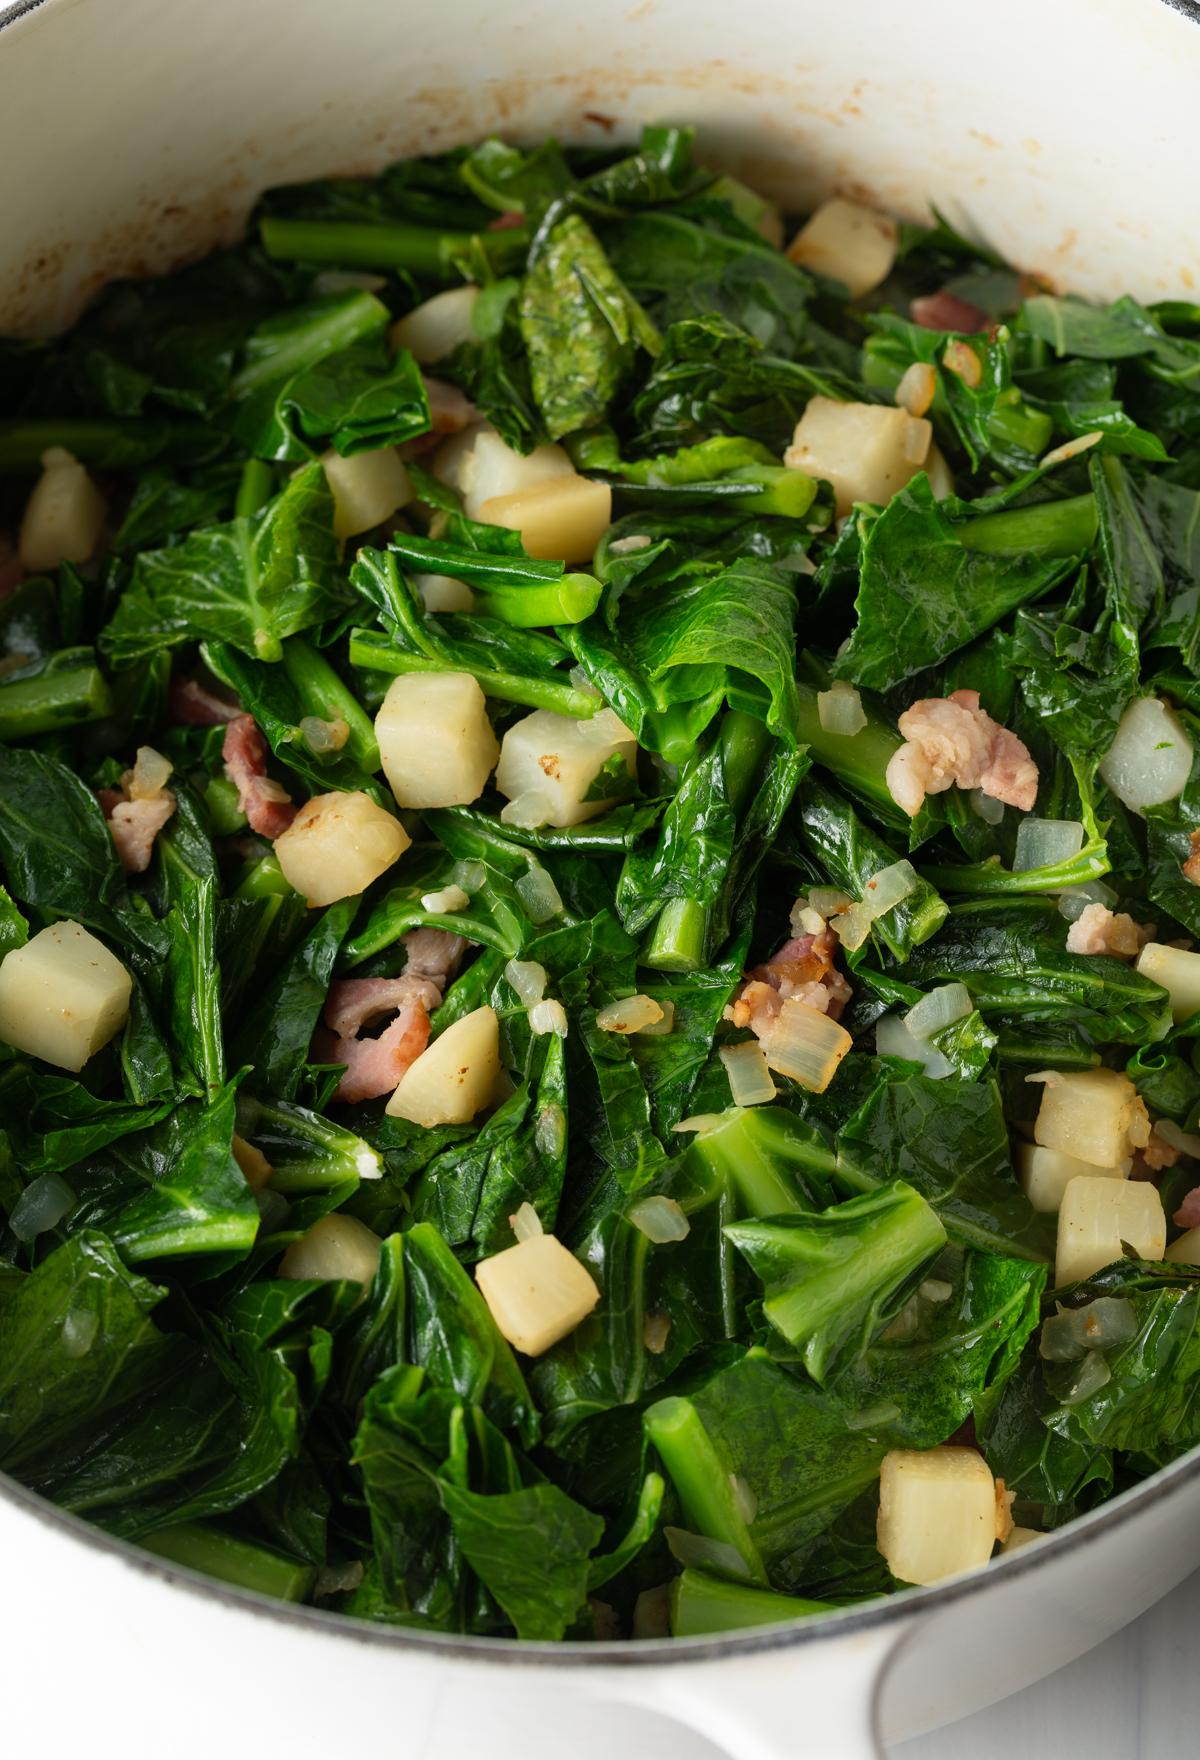 cooking collard greens